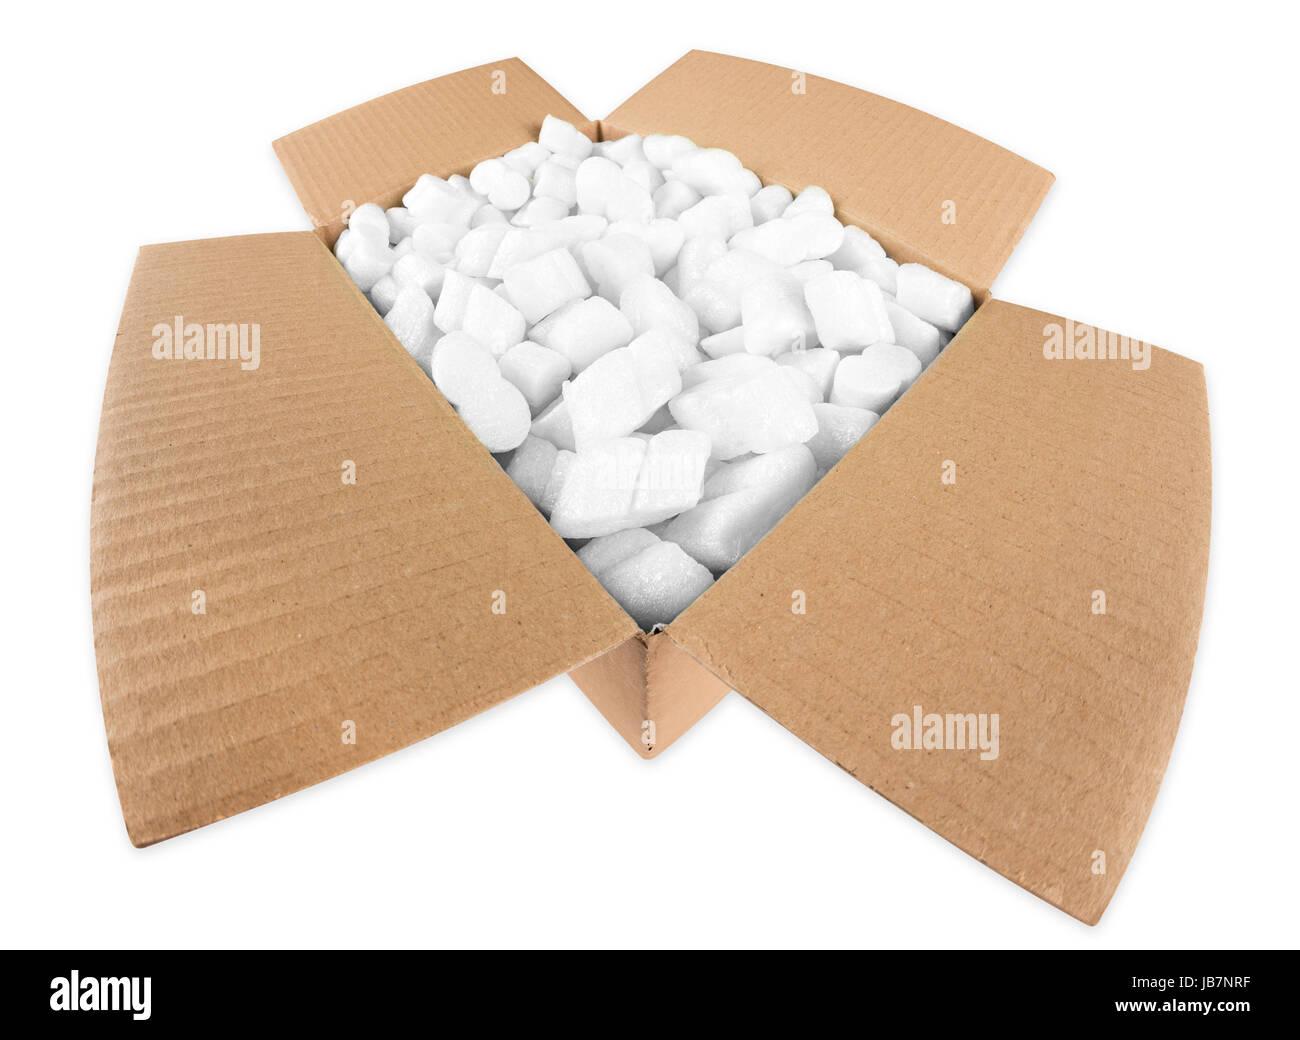 Offenes Paket mit styroporflocken Stock Photo